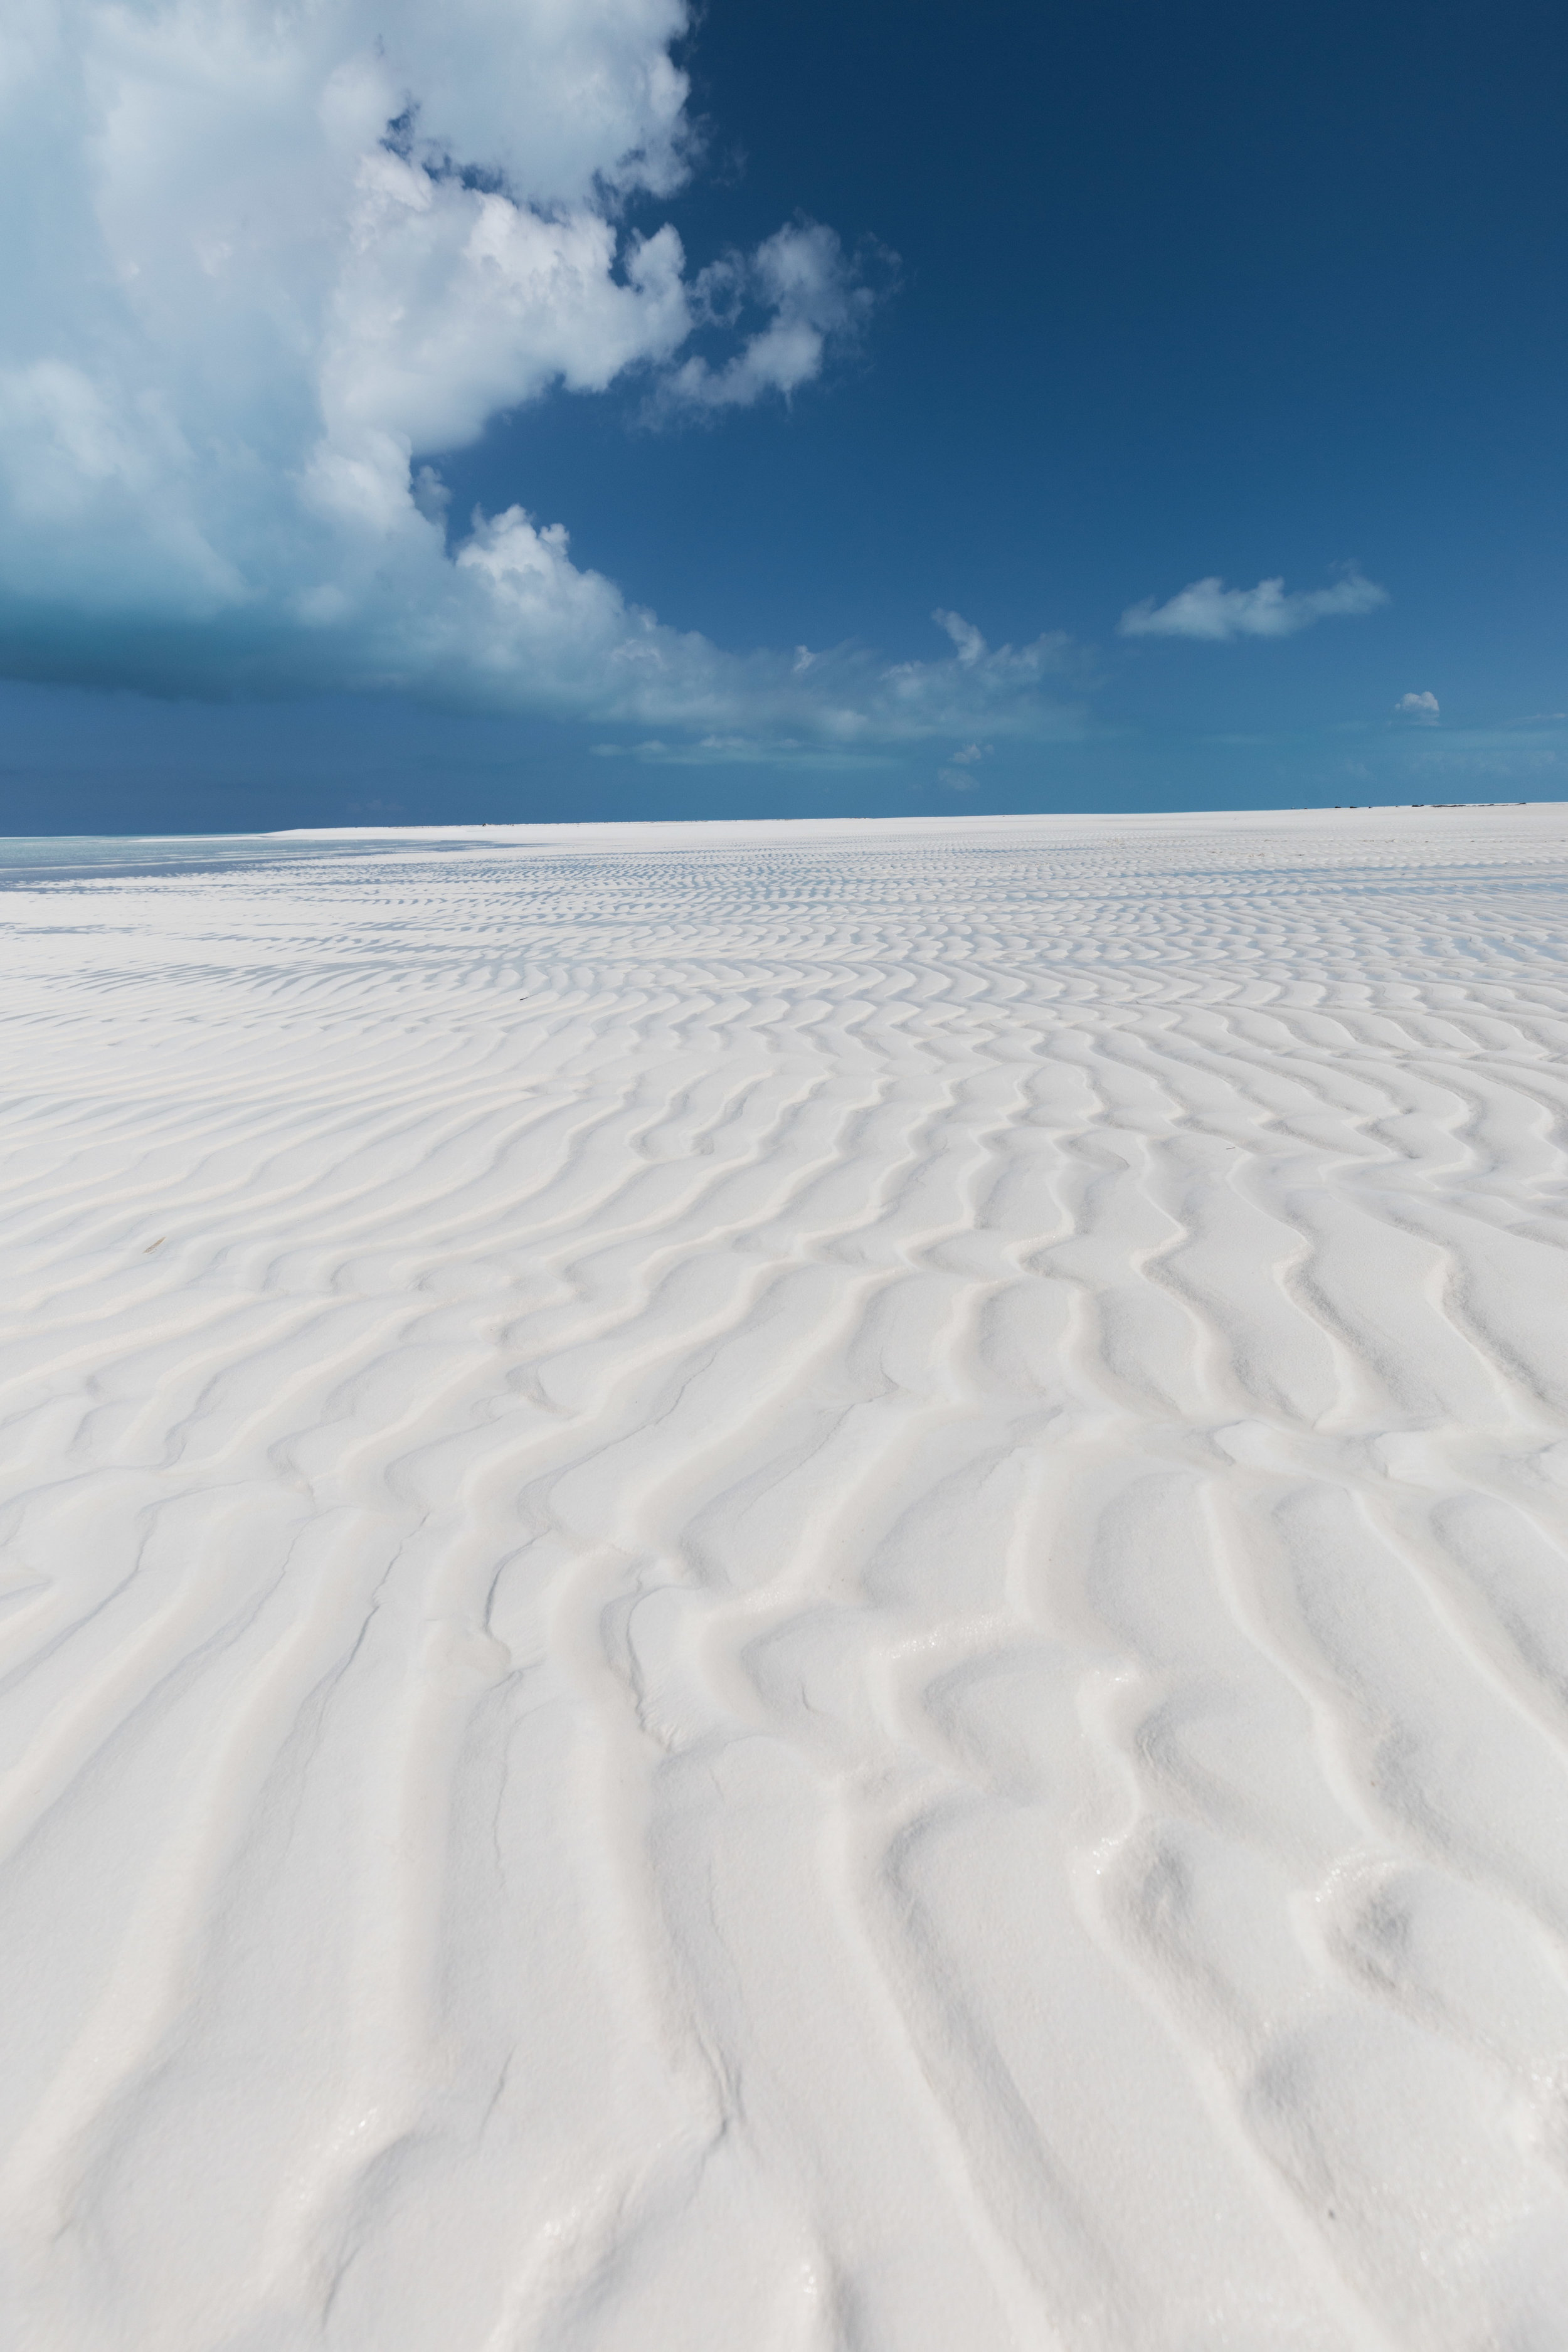 Sandy Cay, Little Exuma, Bahamas. ©Geoff Coombs